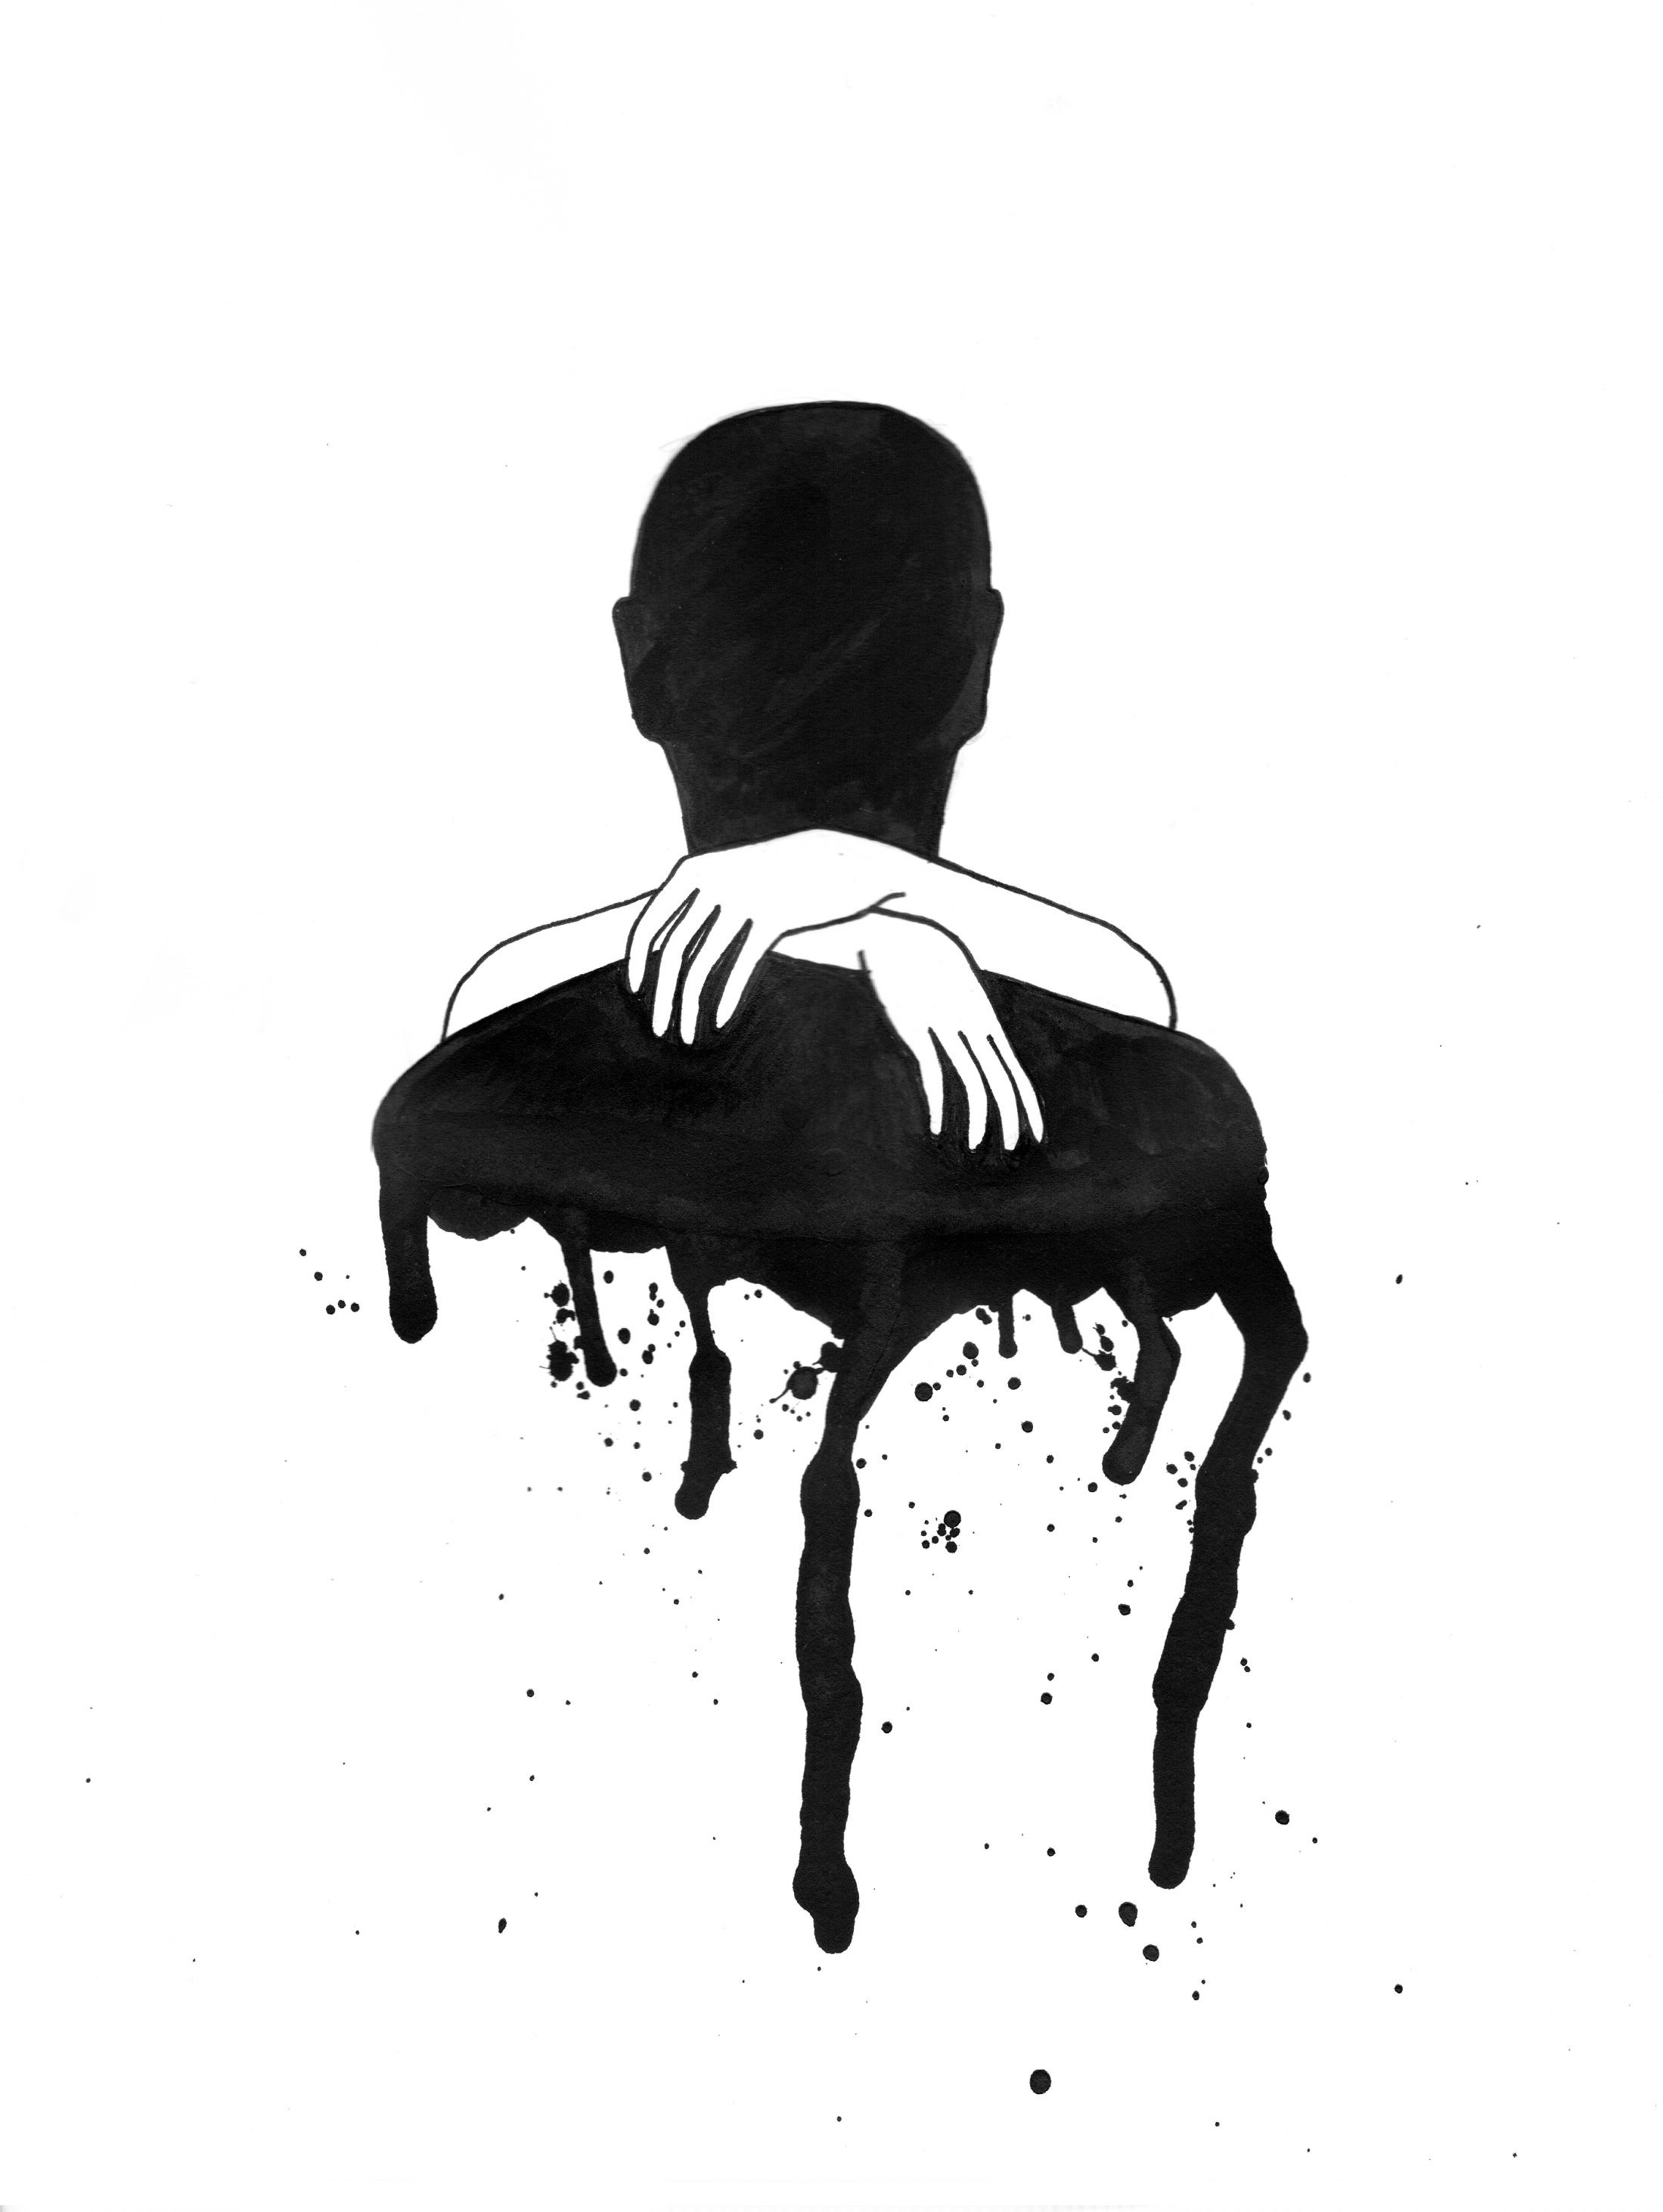 poetry_illustrations_0002.jpg